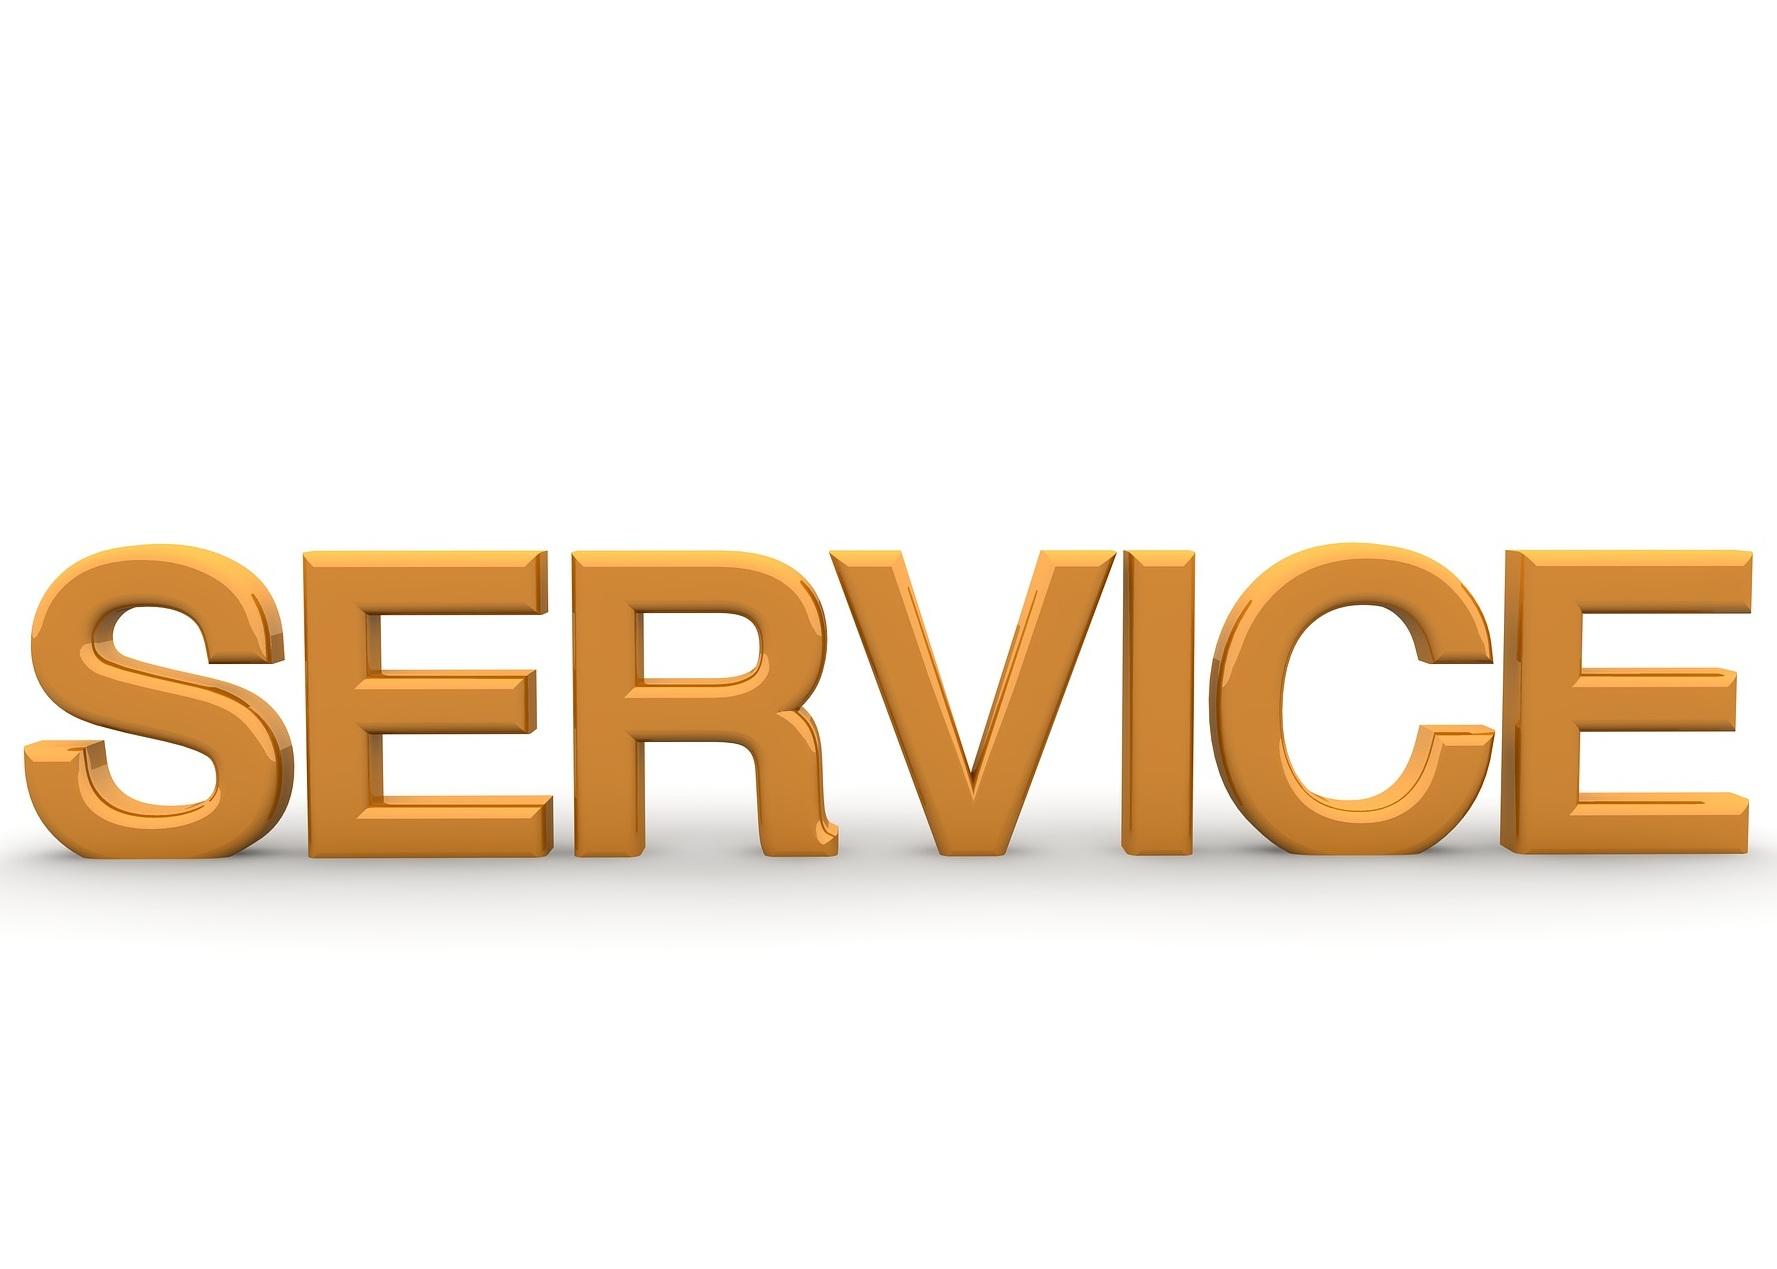 service-1019822_1920.jpg